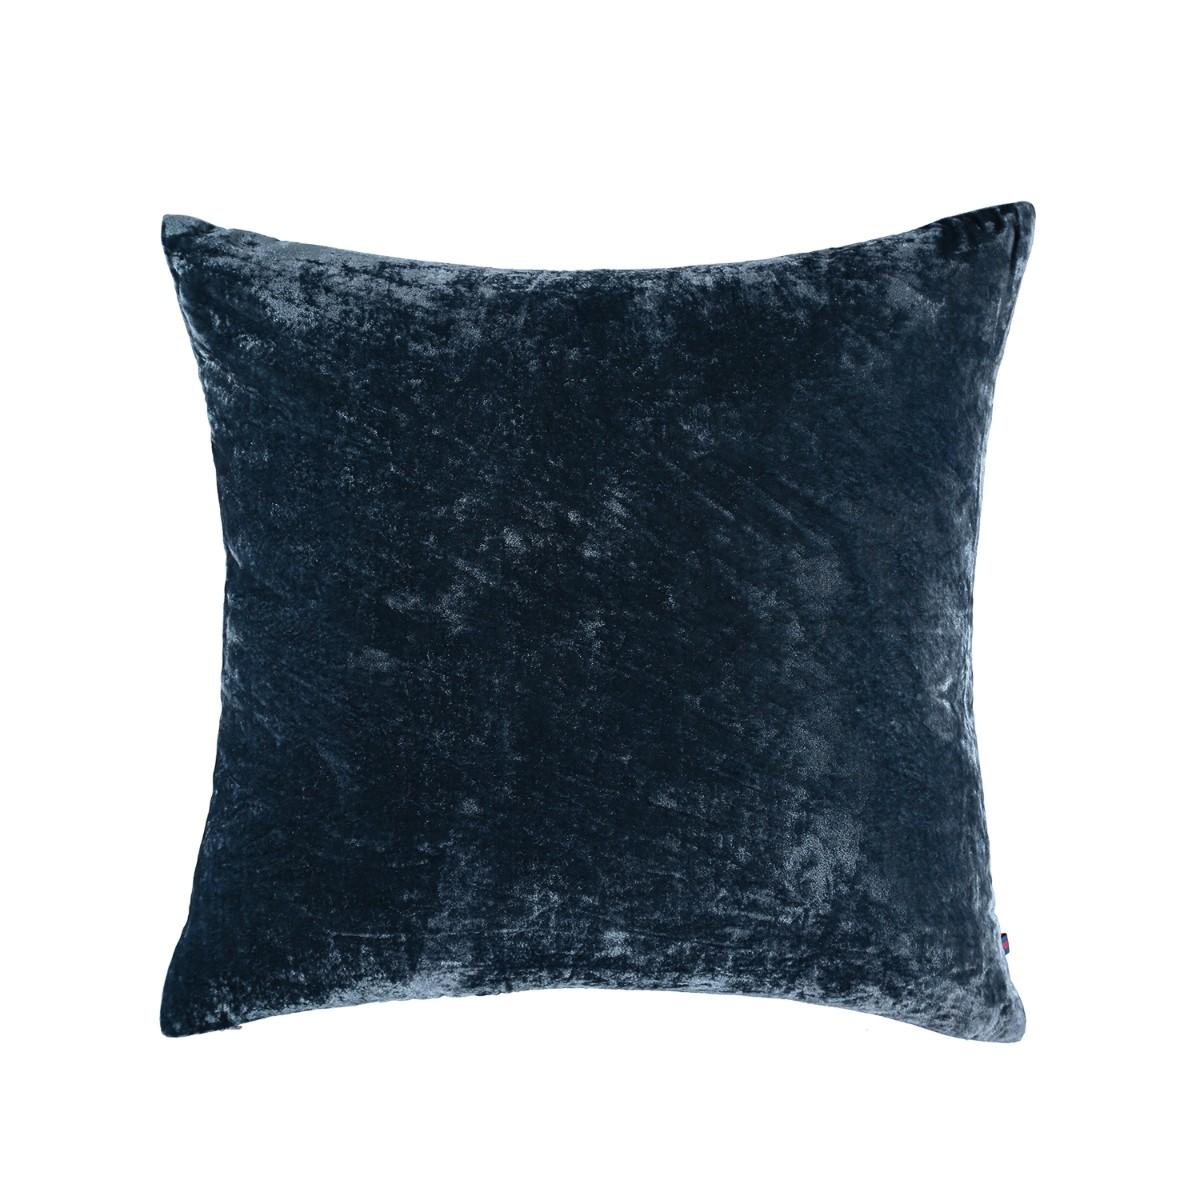 William Yeoward |Paddy Velvet Cushion Denim Noir